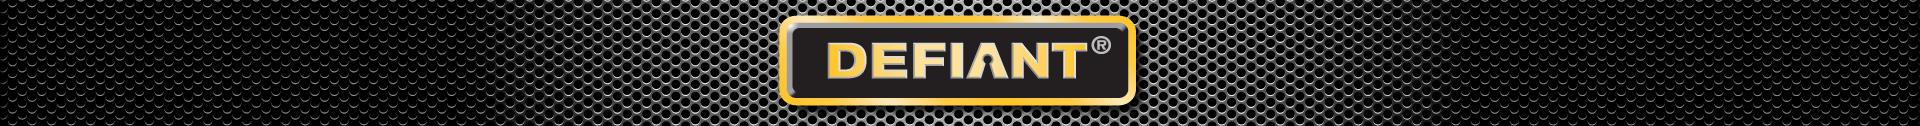 Defiant Logo Banner